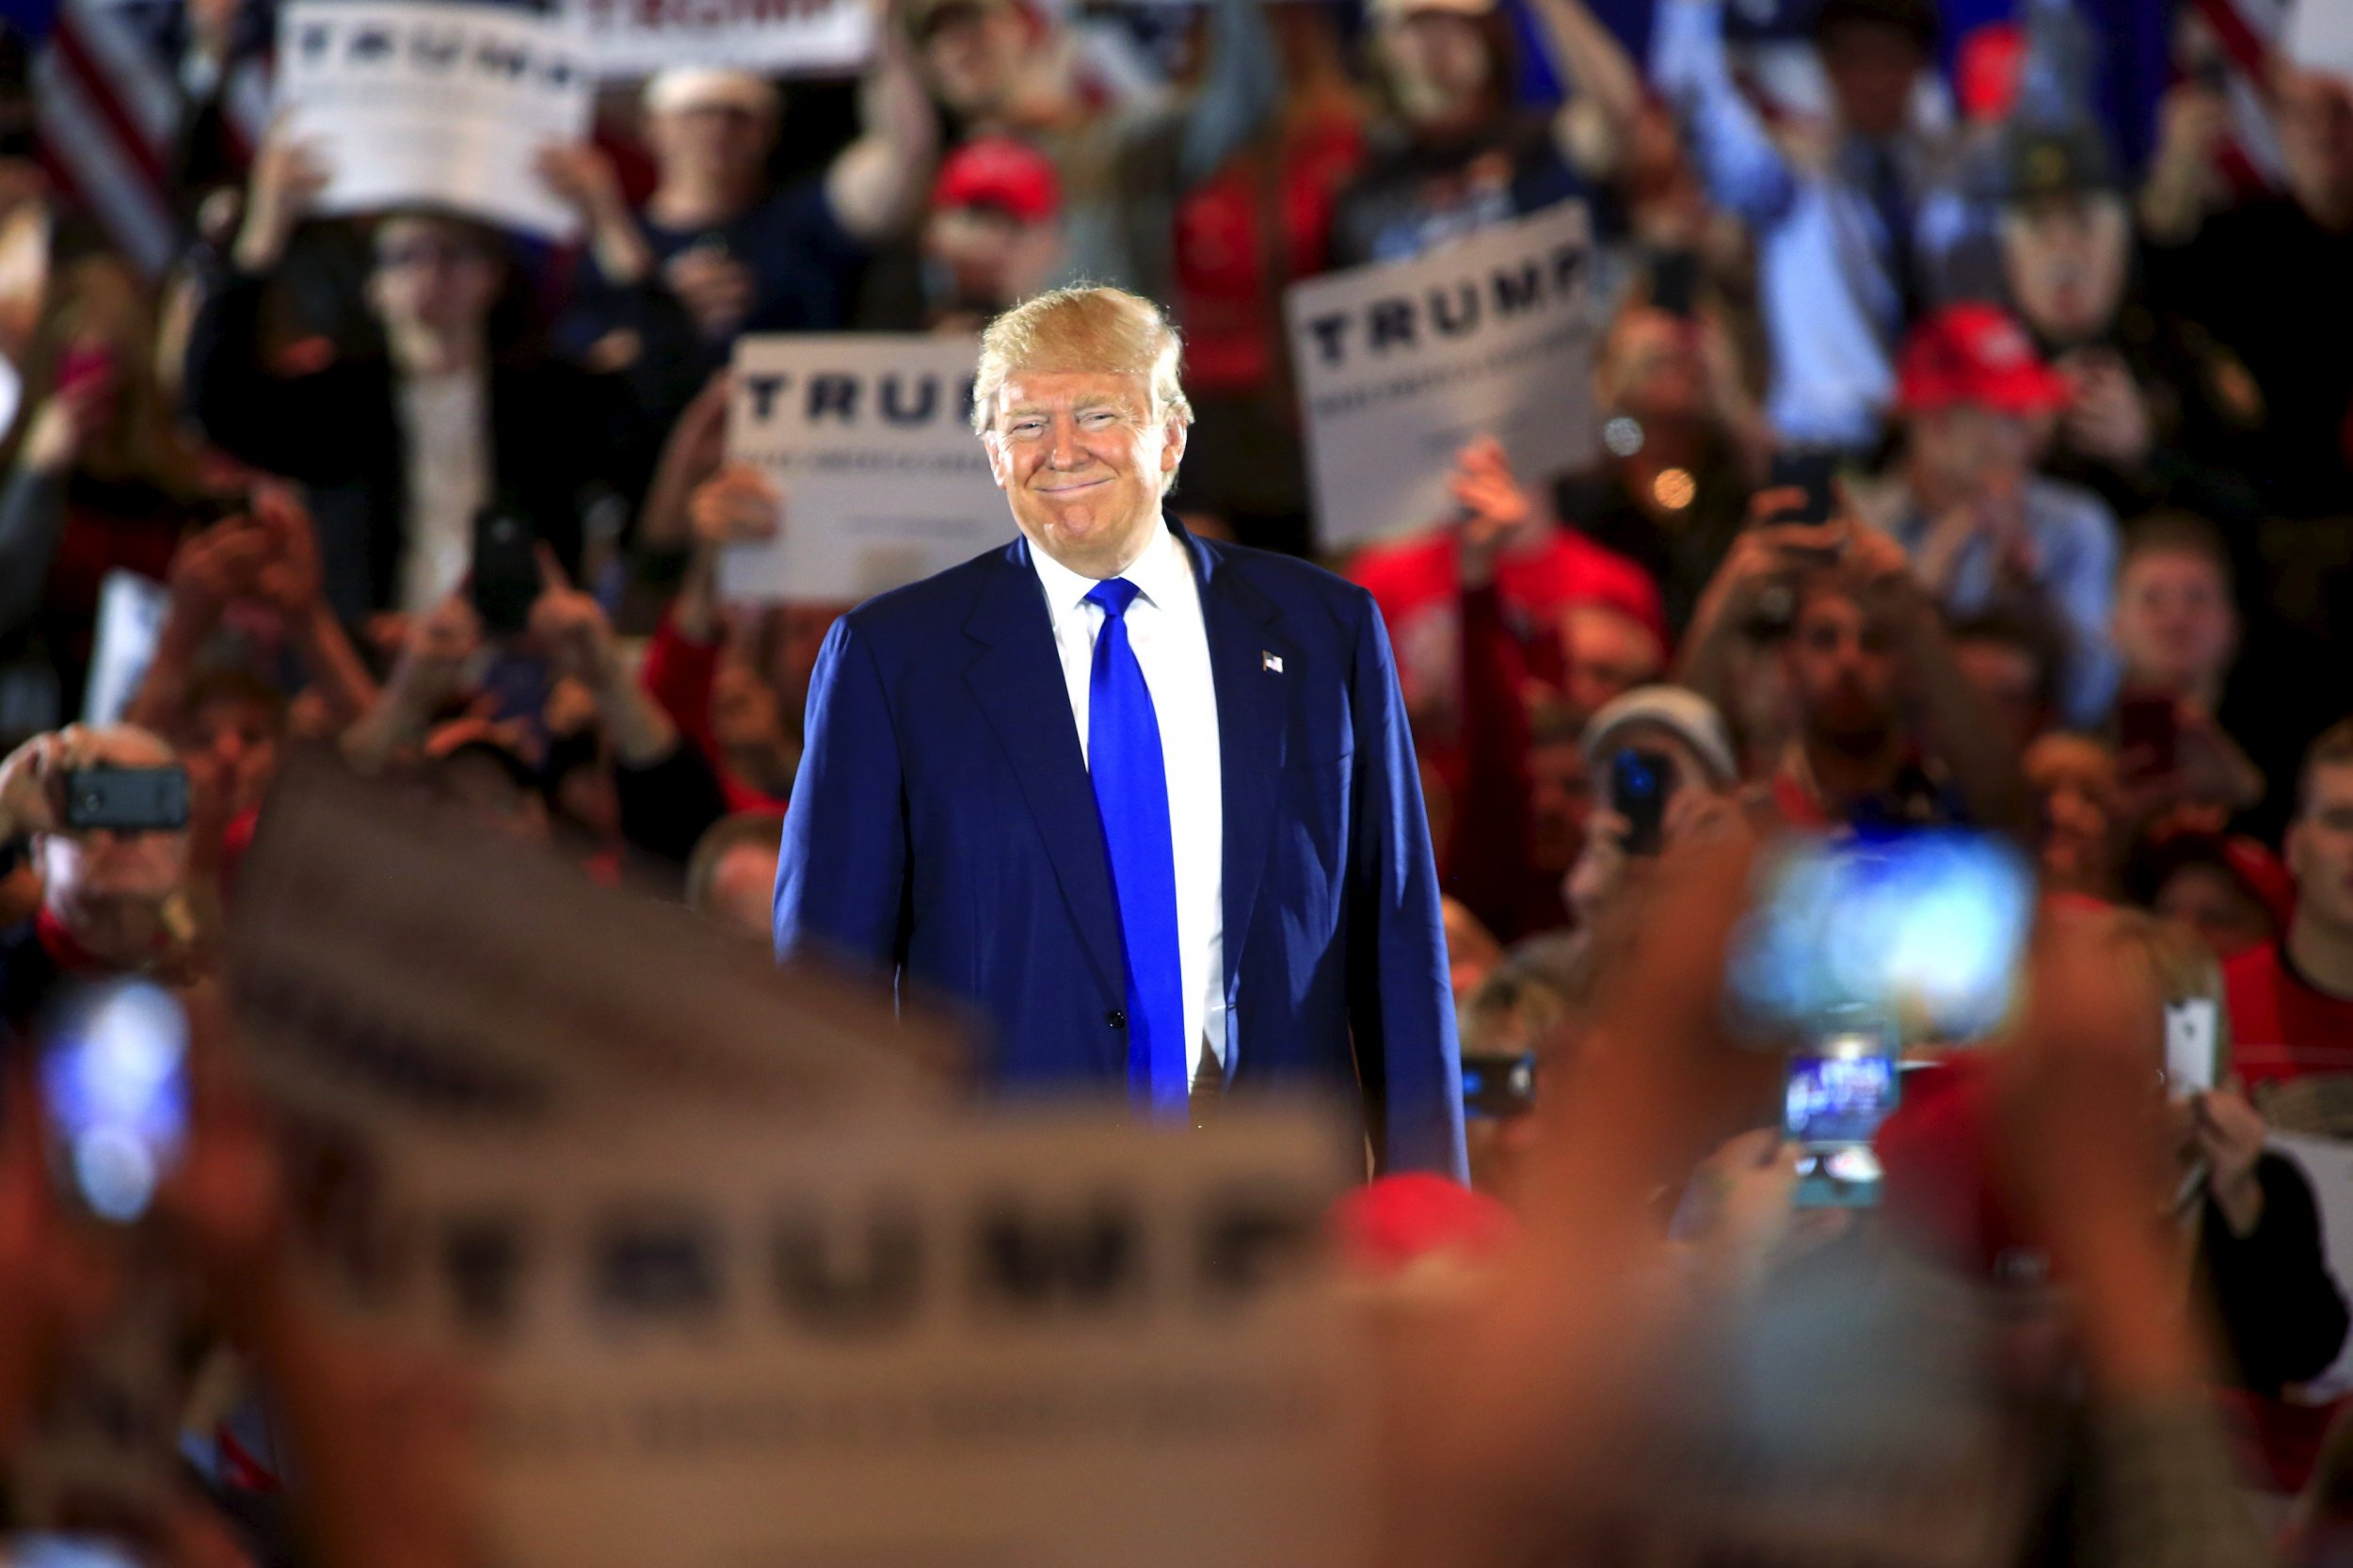 13/03/2016-Donald Trump